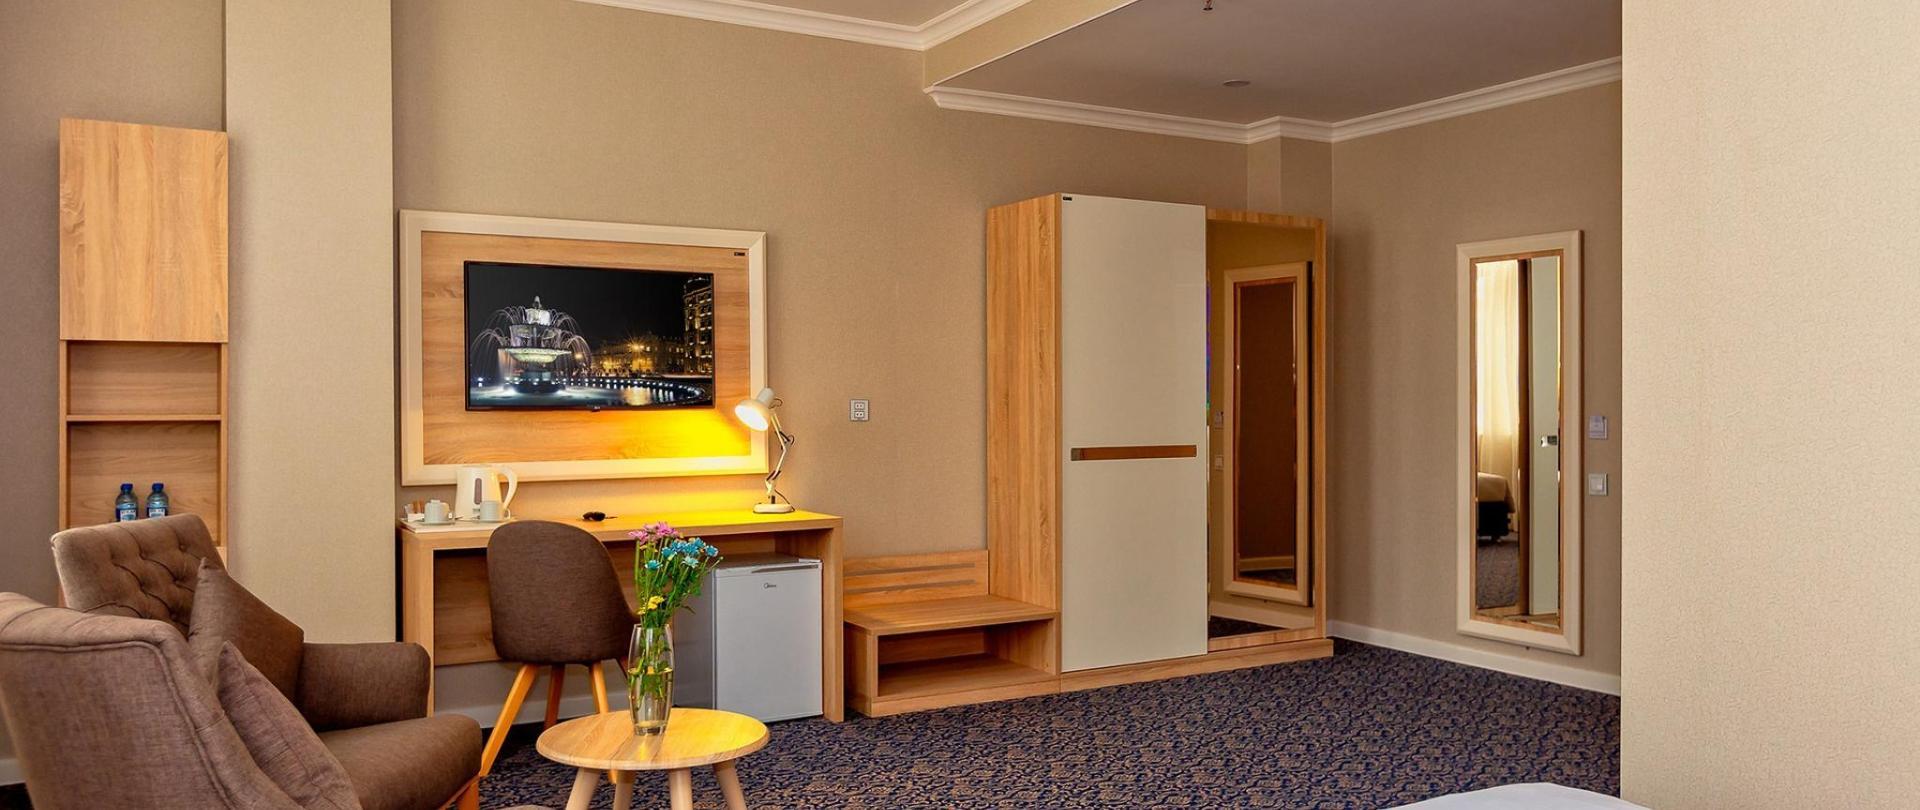 Metrocity Hotel-25.jpg